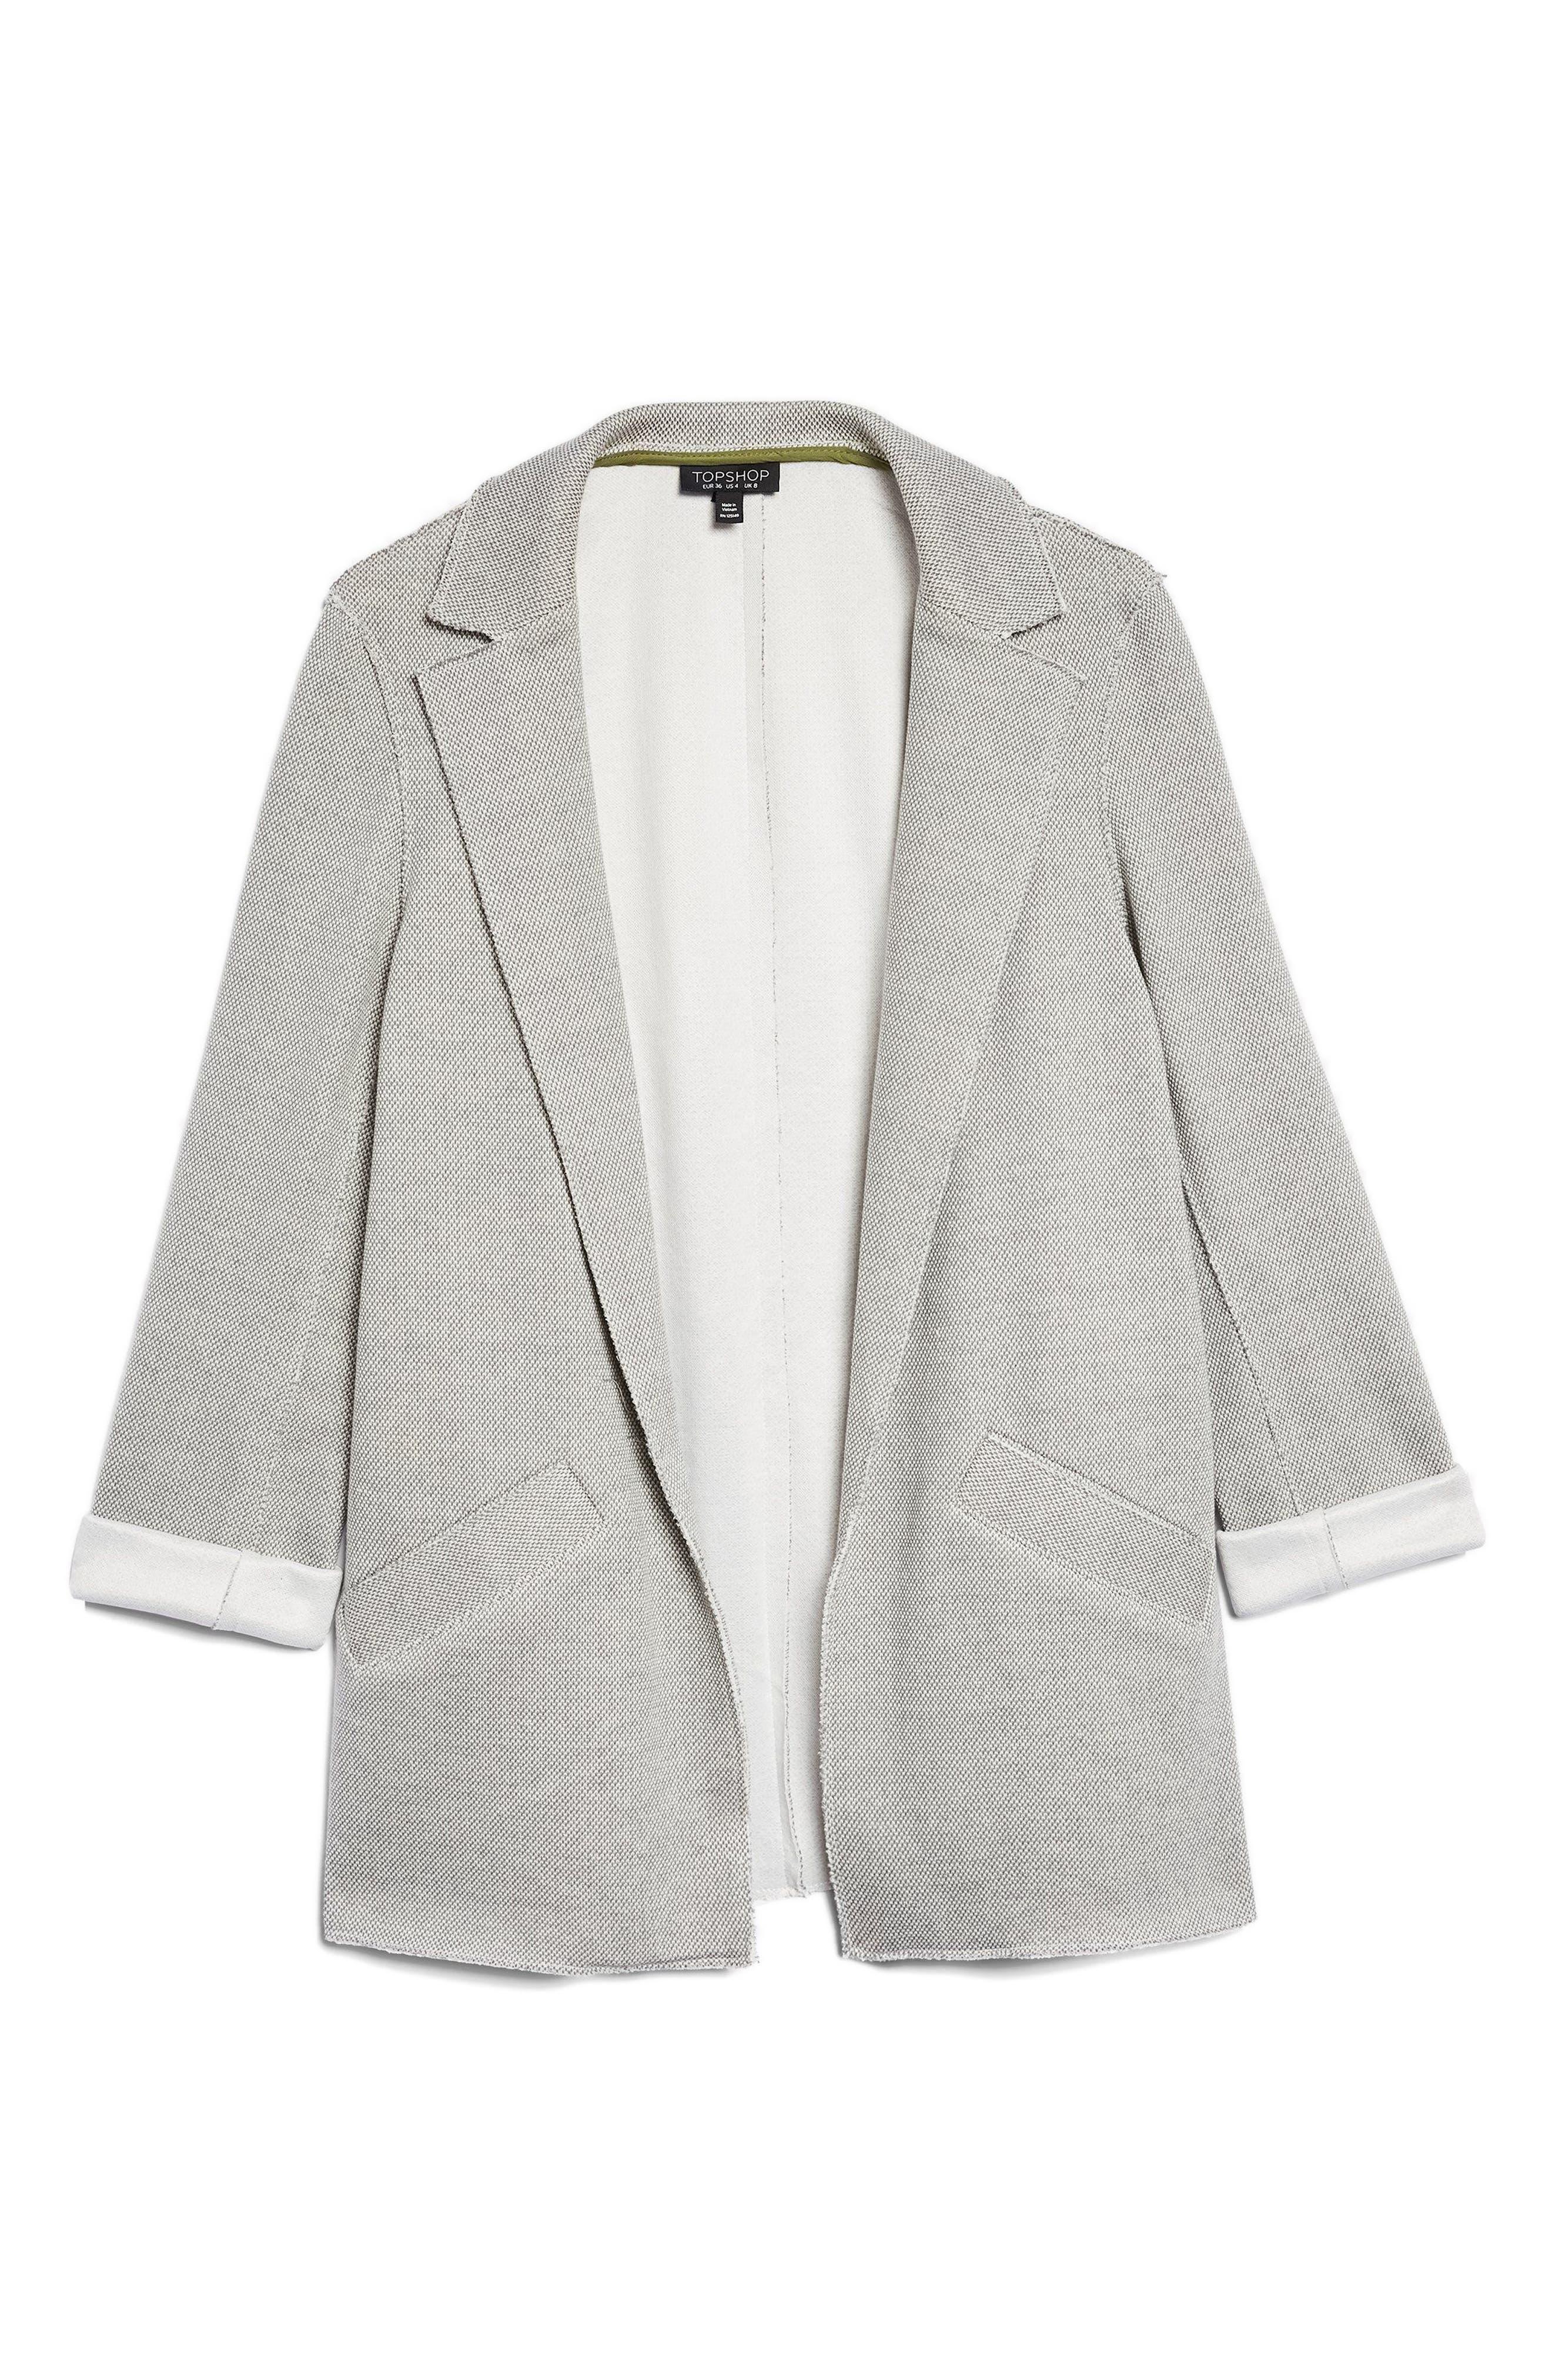 Deconcrusted Jersey Blazer,                             Alternate thumbnail 5, color,                             020